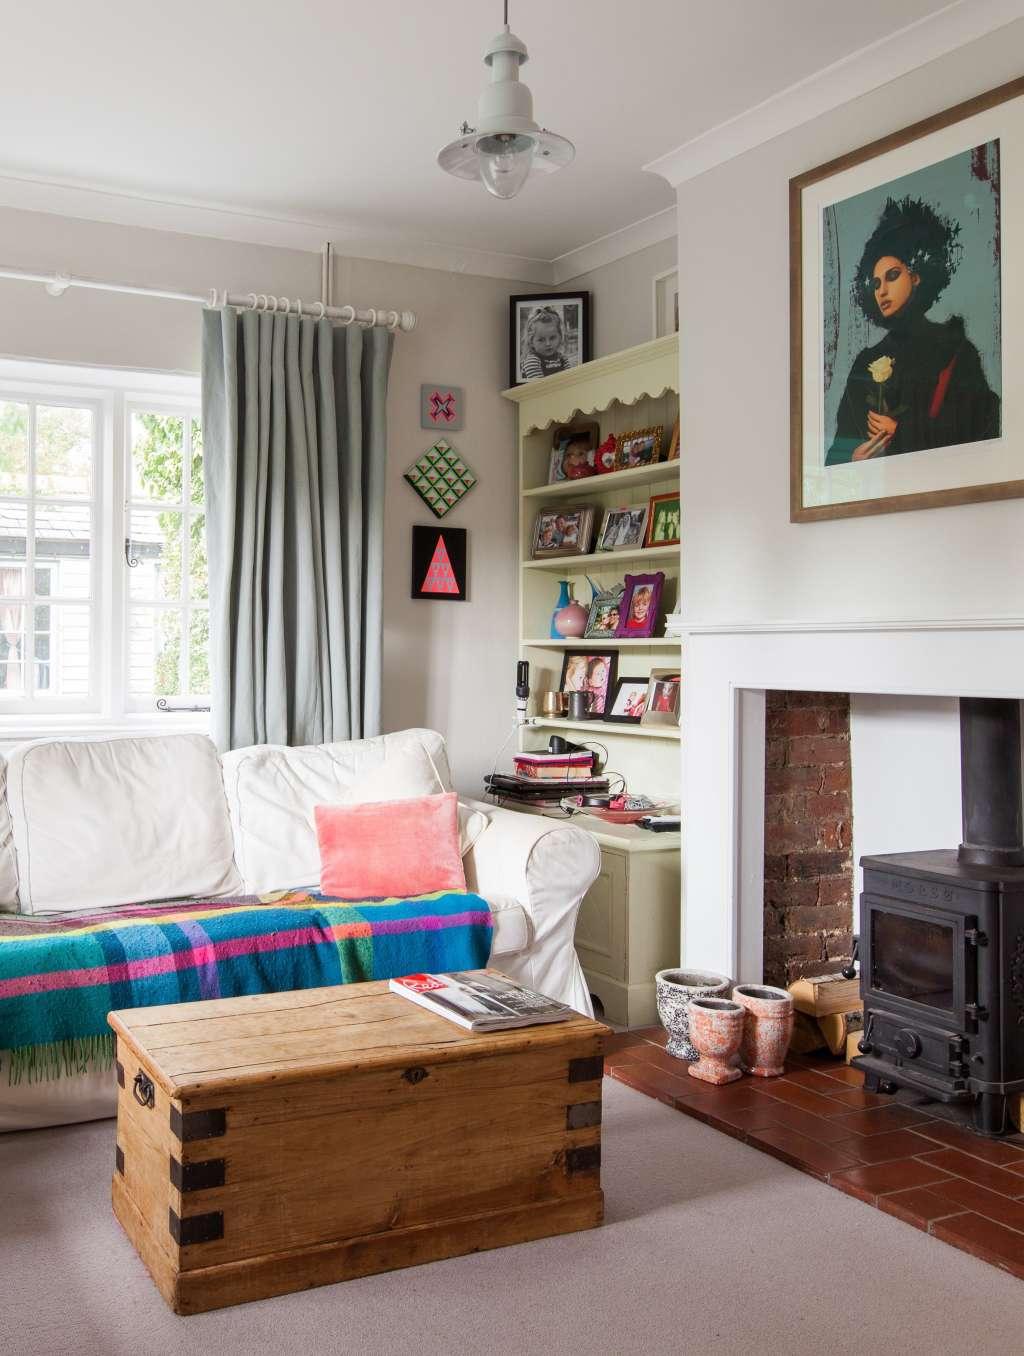 Kelly s modern english country cottage studio 915a5f5a7275220e42ce756193b3c4a62a36cdfa